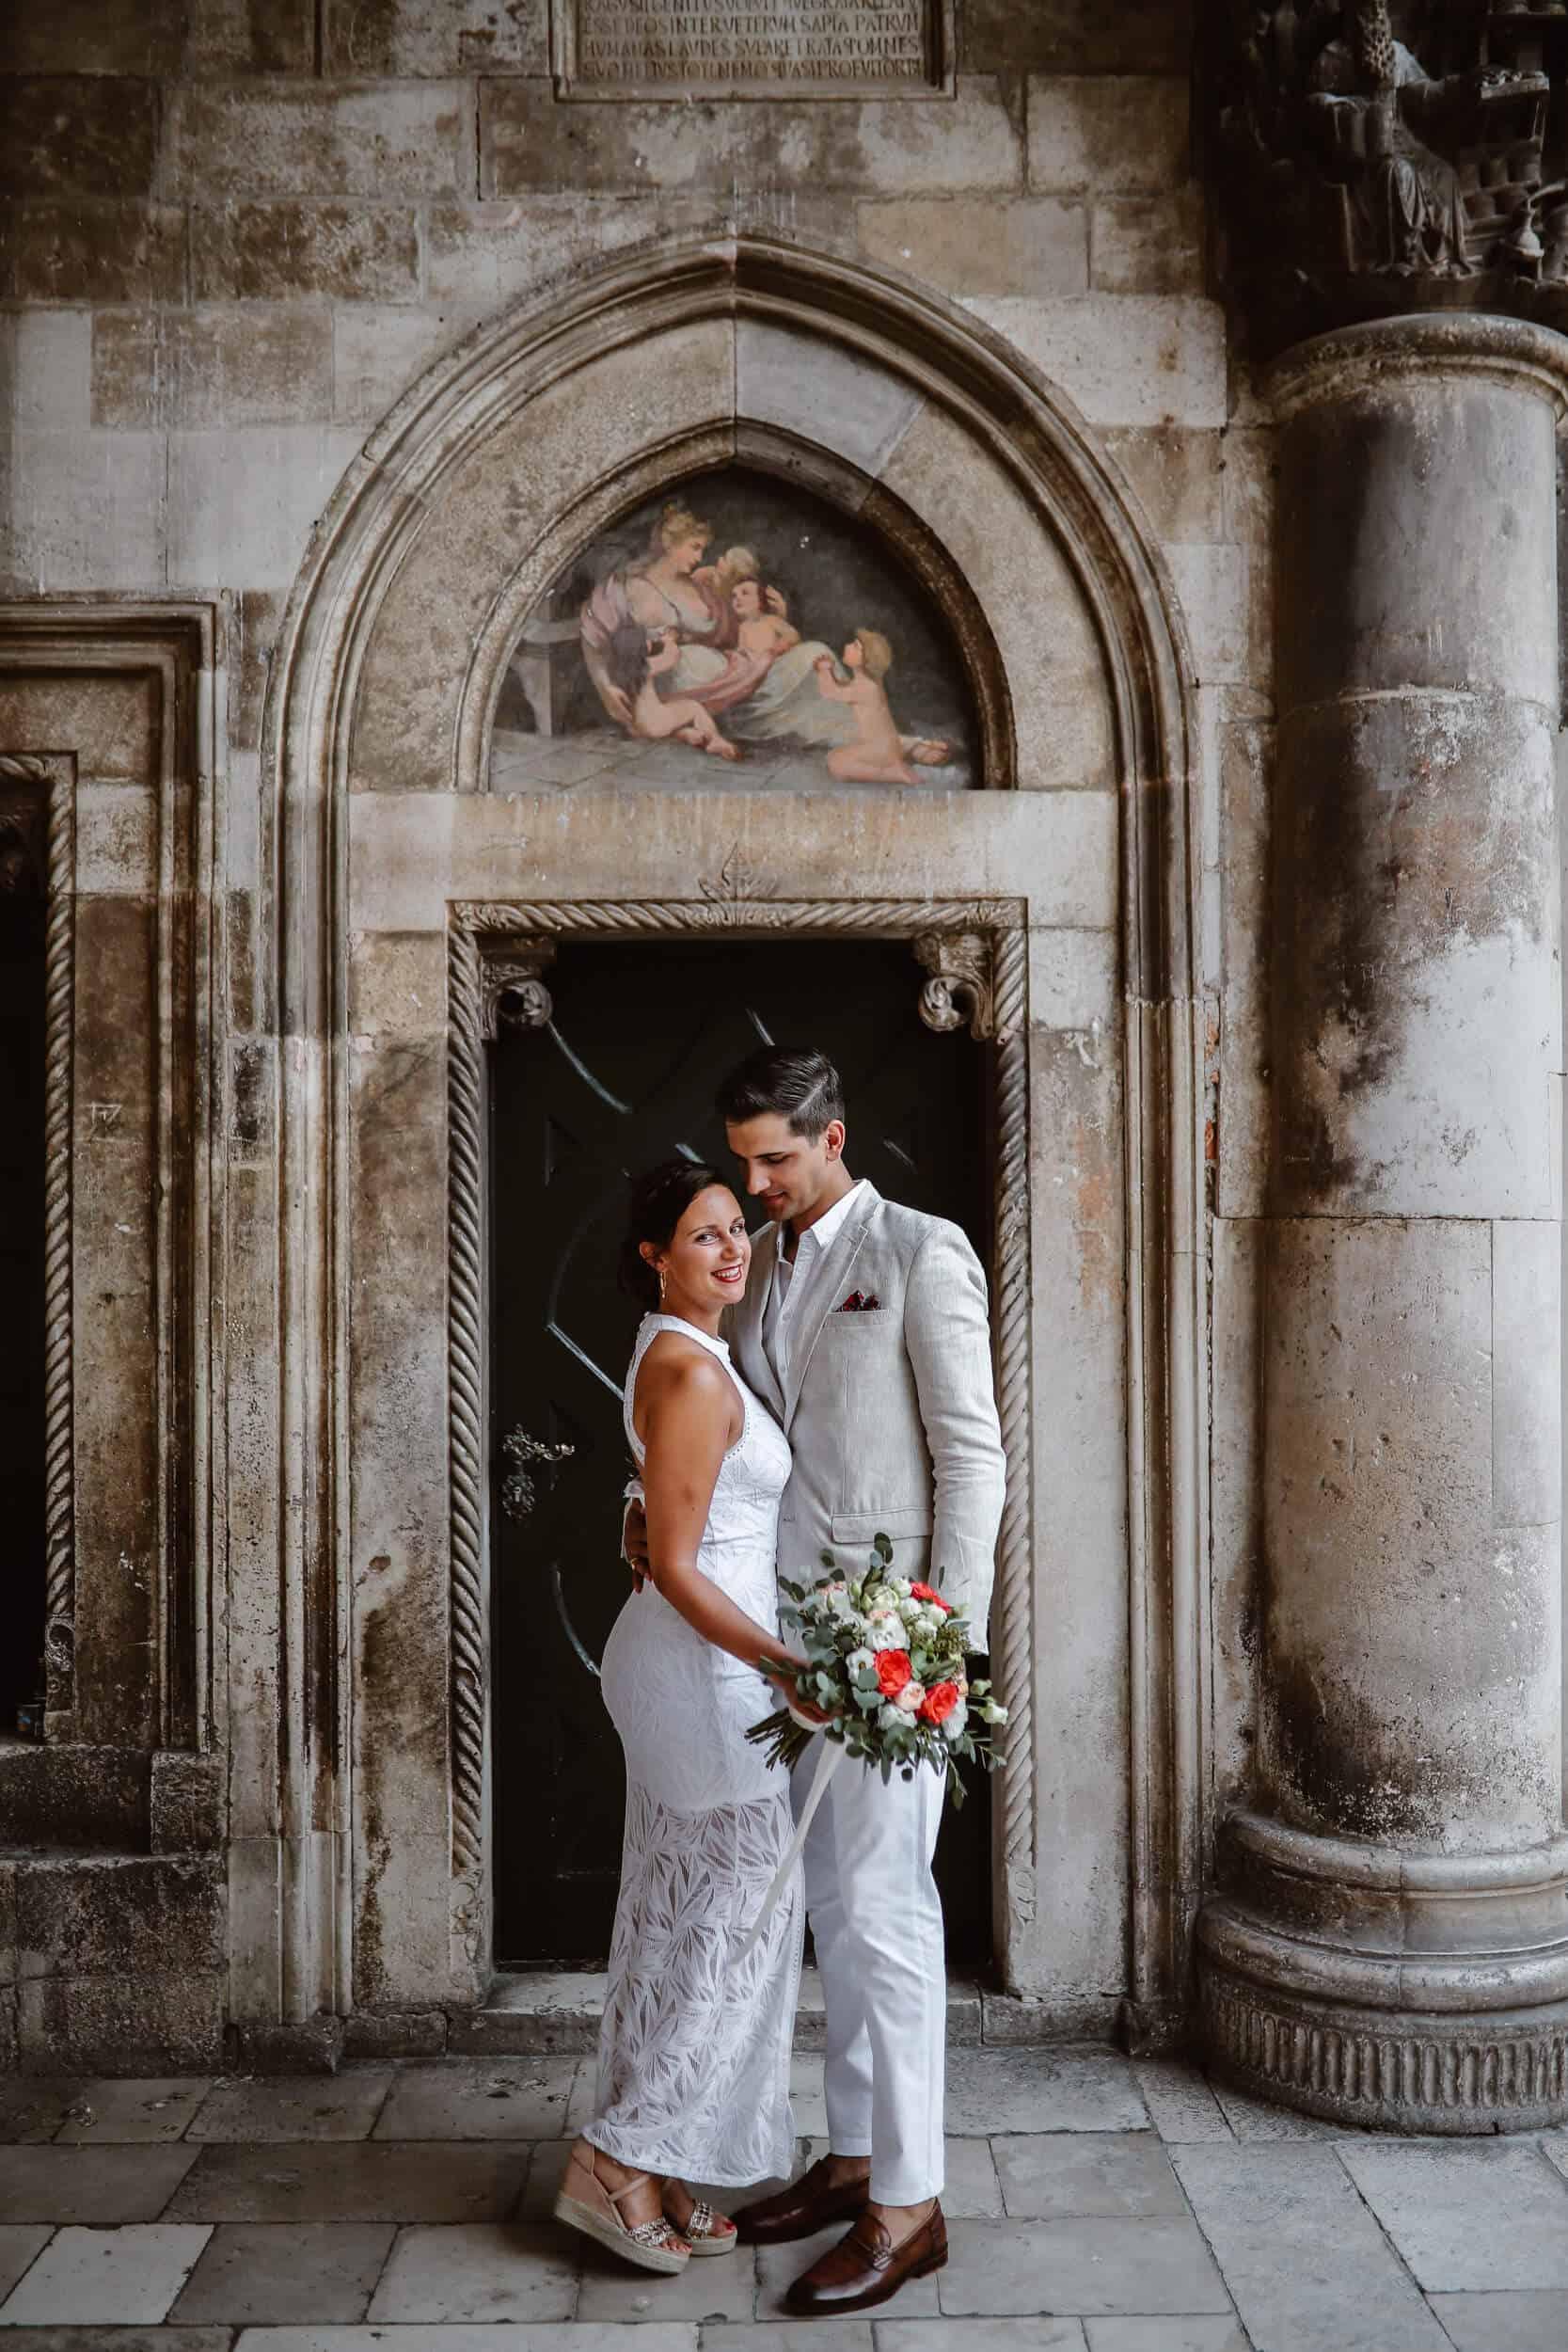 Dubrovnik karaka boat elopement matea stephan 5 | Croatia Elopement Photographer and Videographer